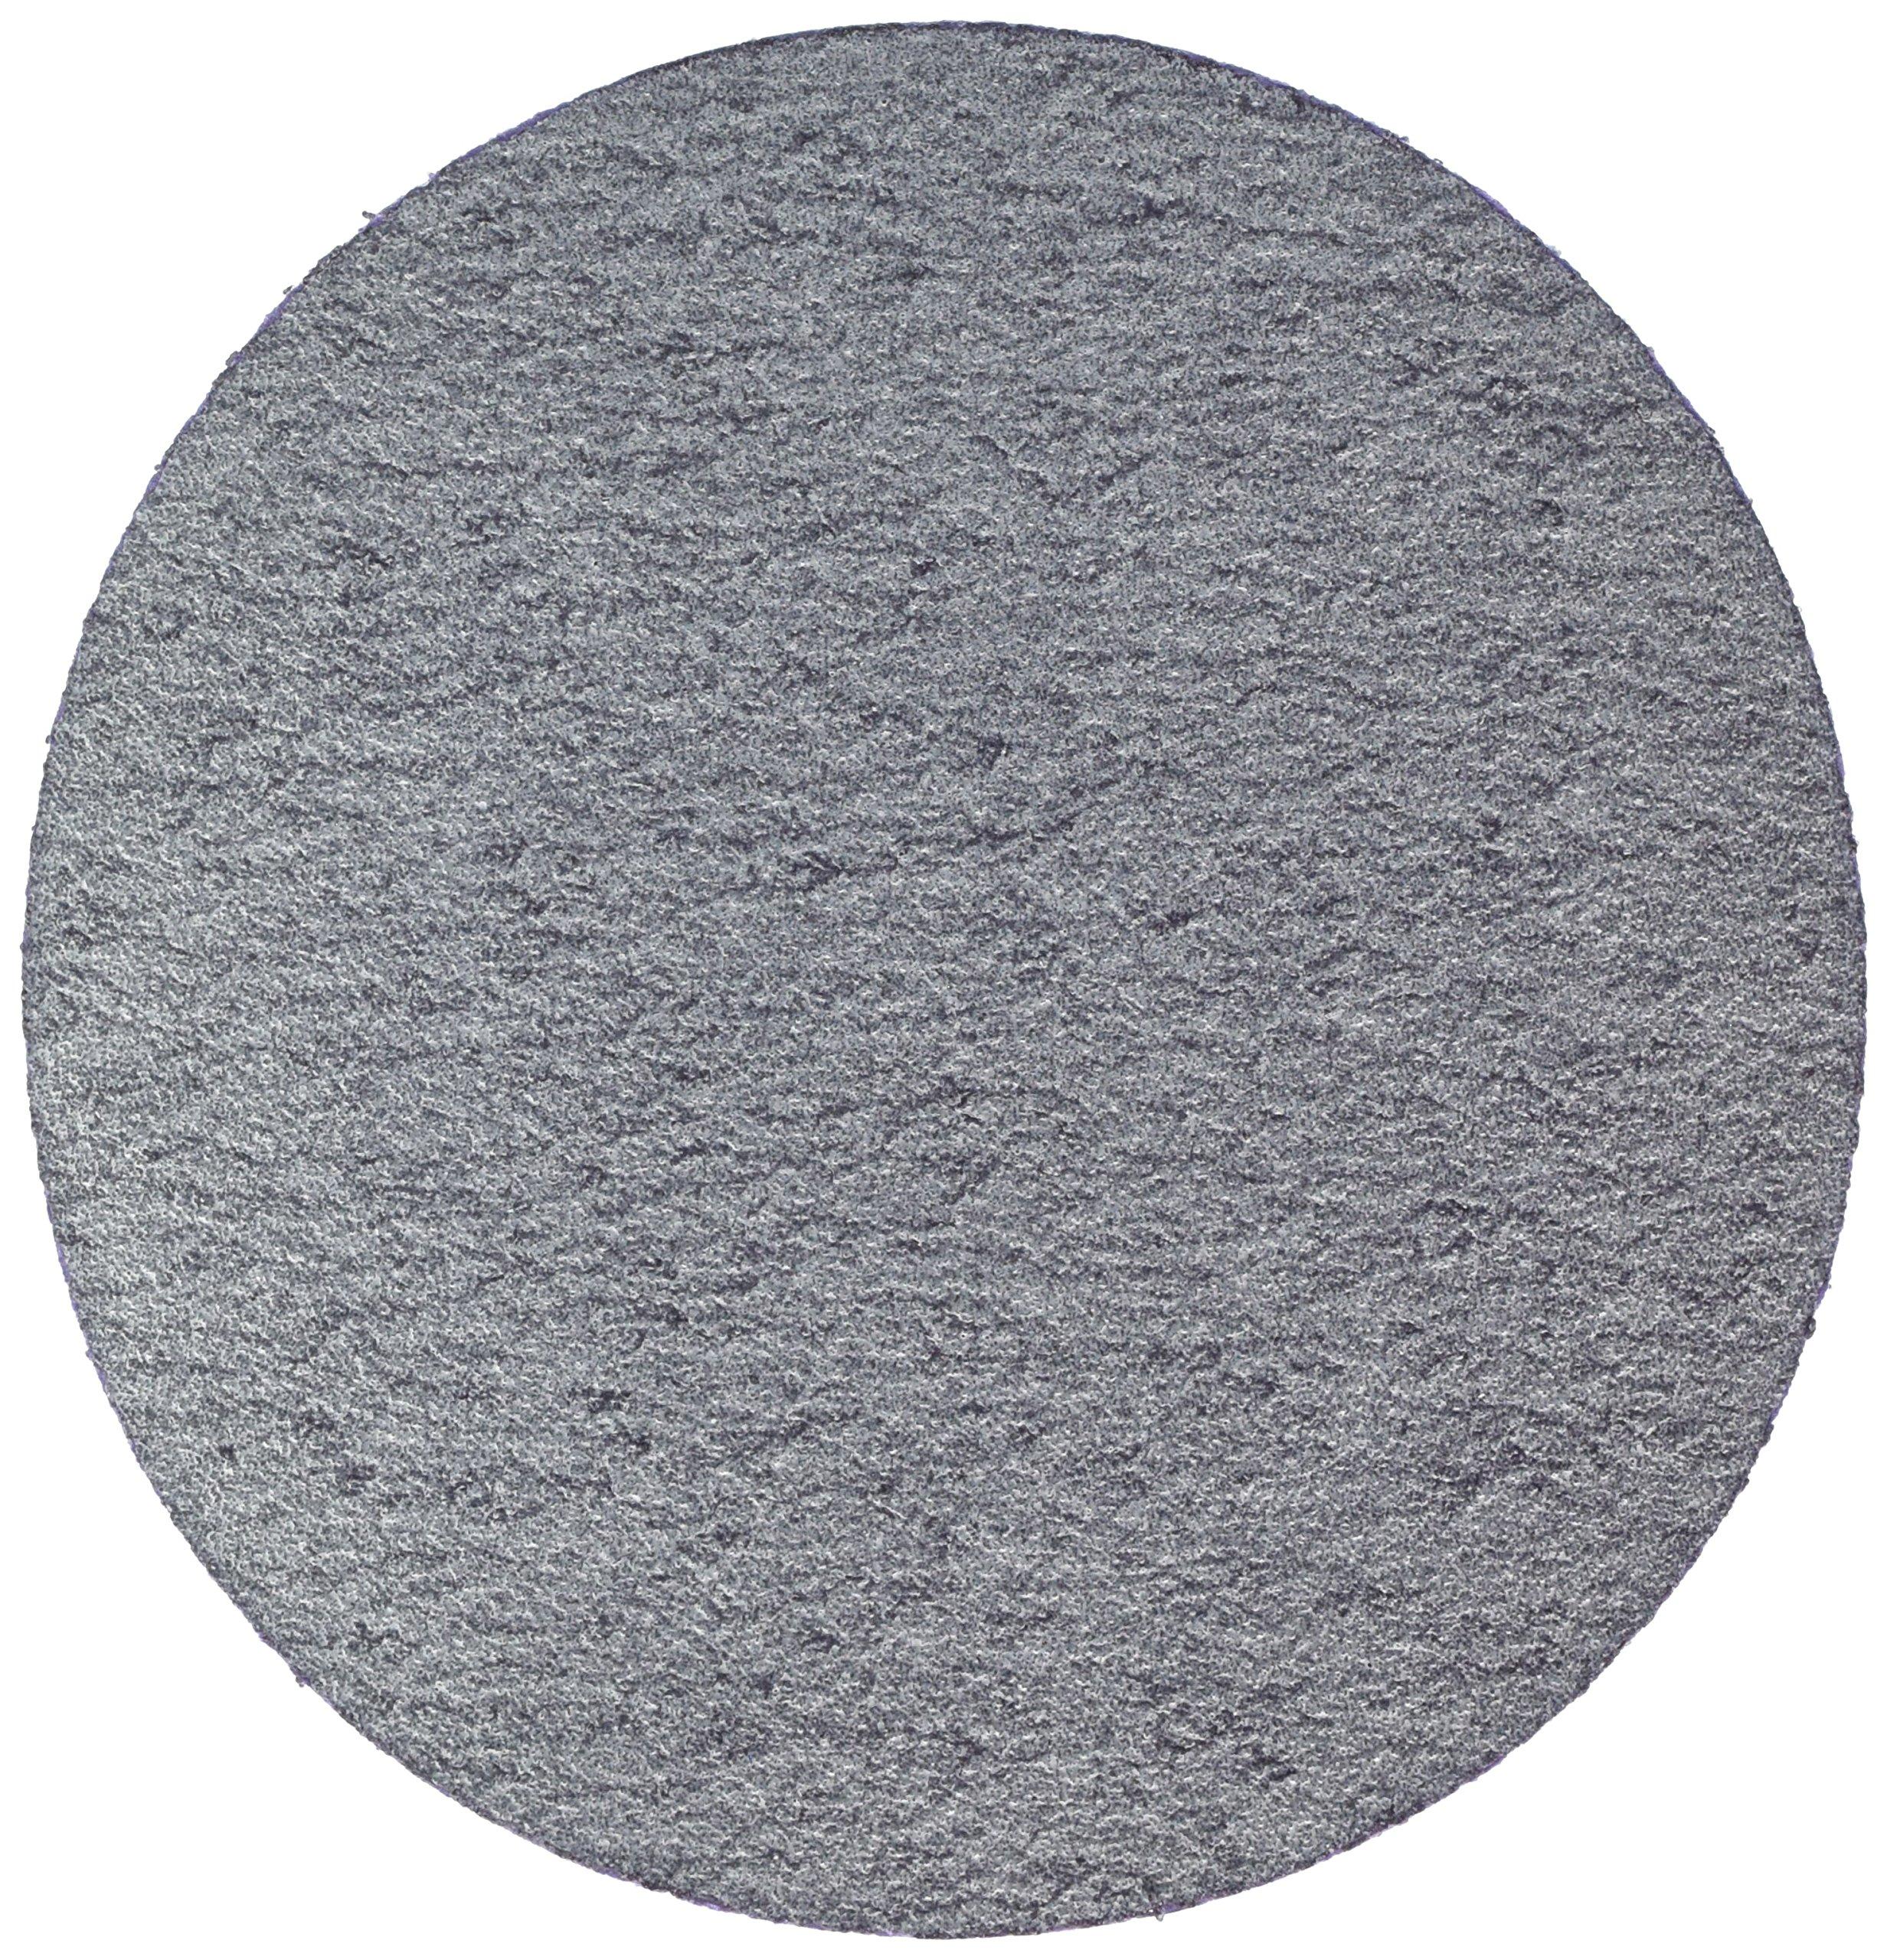 3M 30684 Purple 6'' P80E Grit Abrasive Disc